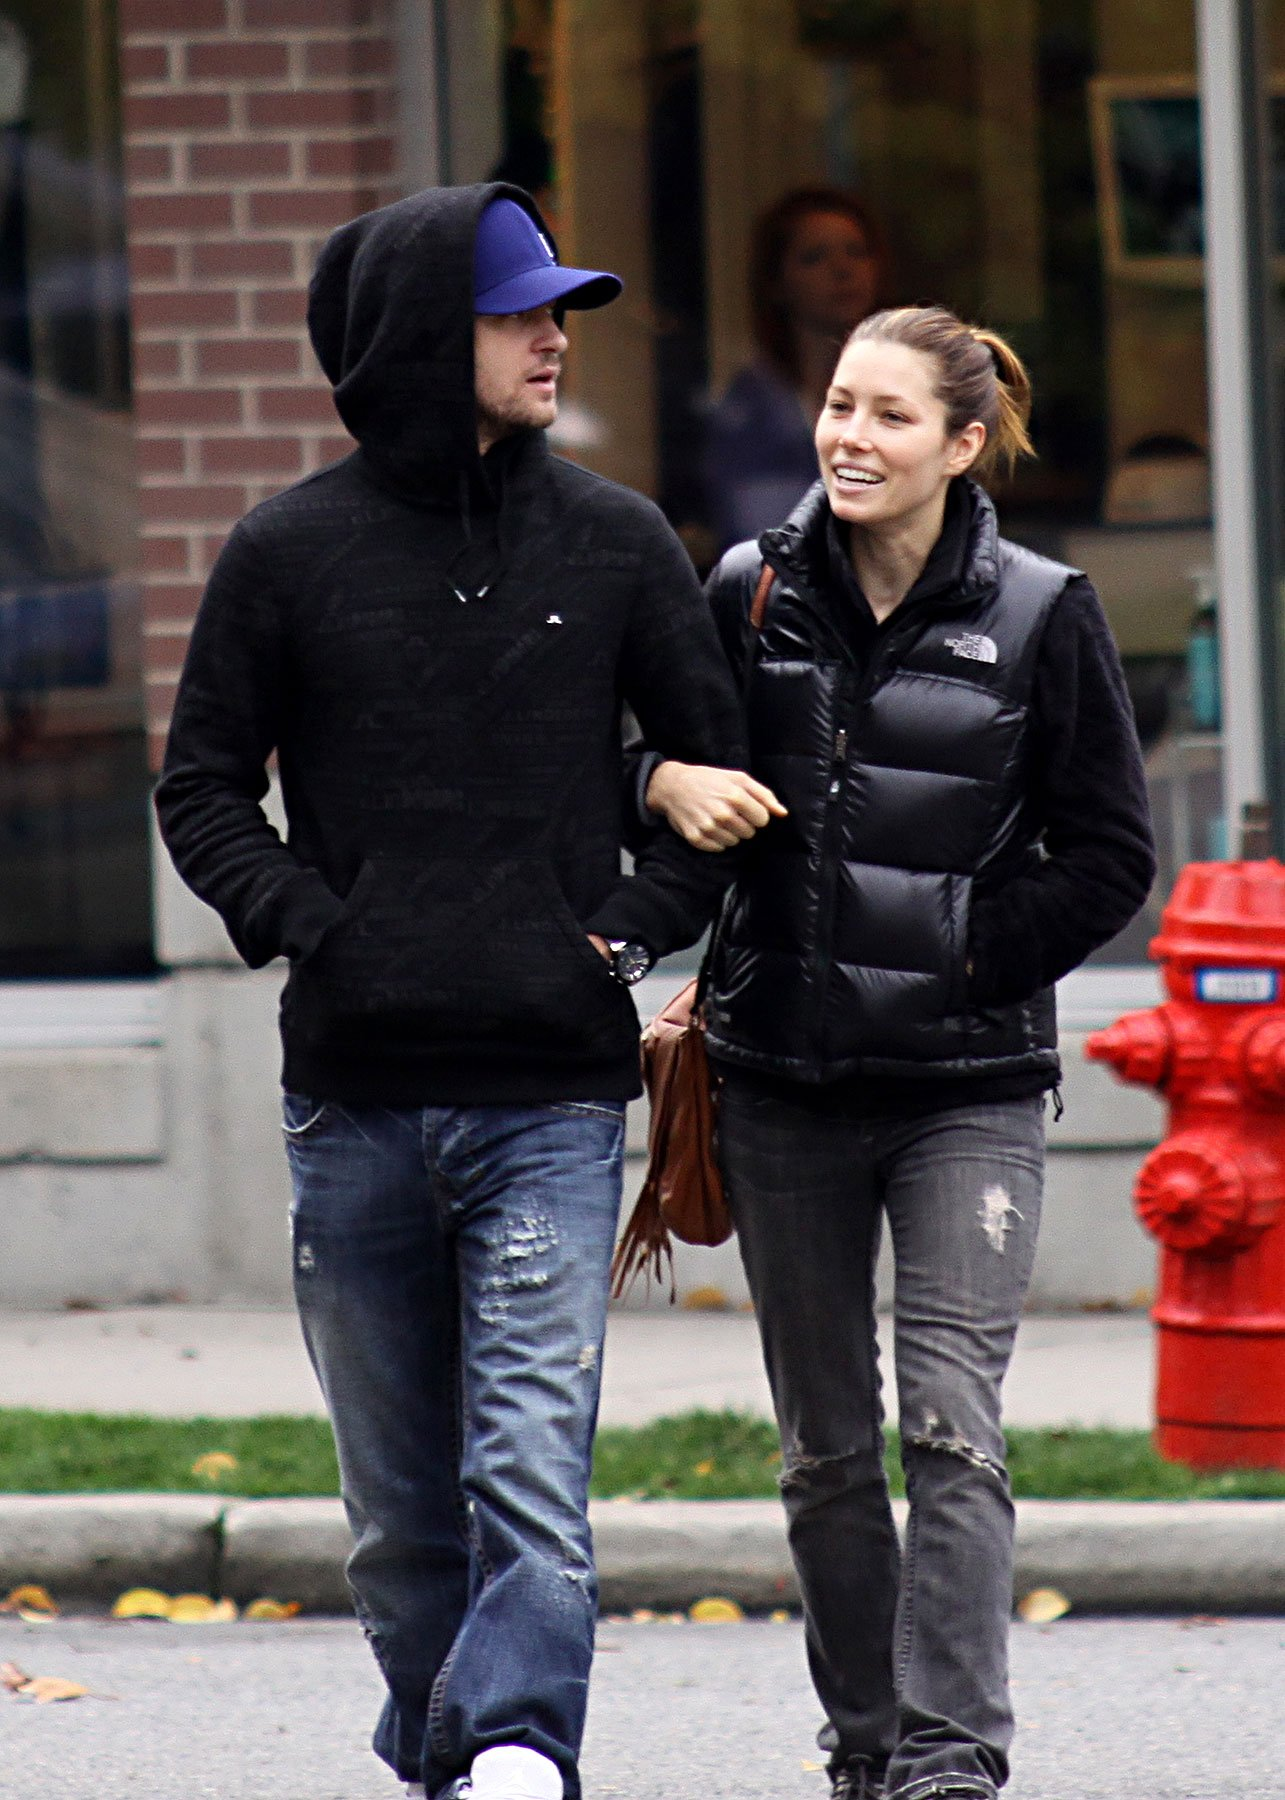 PHOTO GALLERY: Justin Timberlake & Jessica Biel Still On